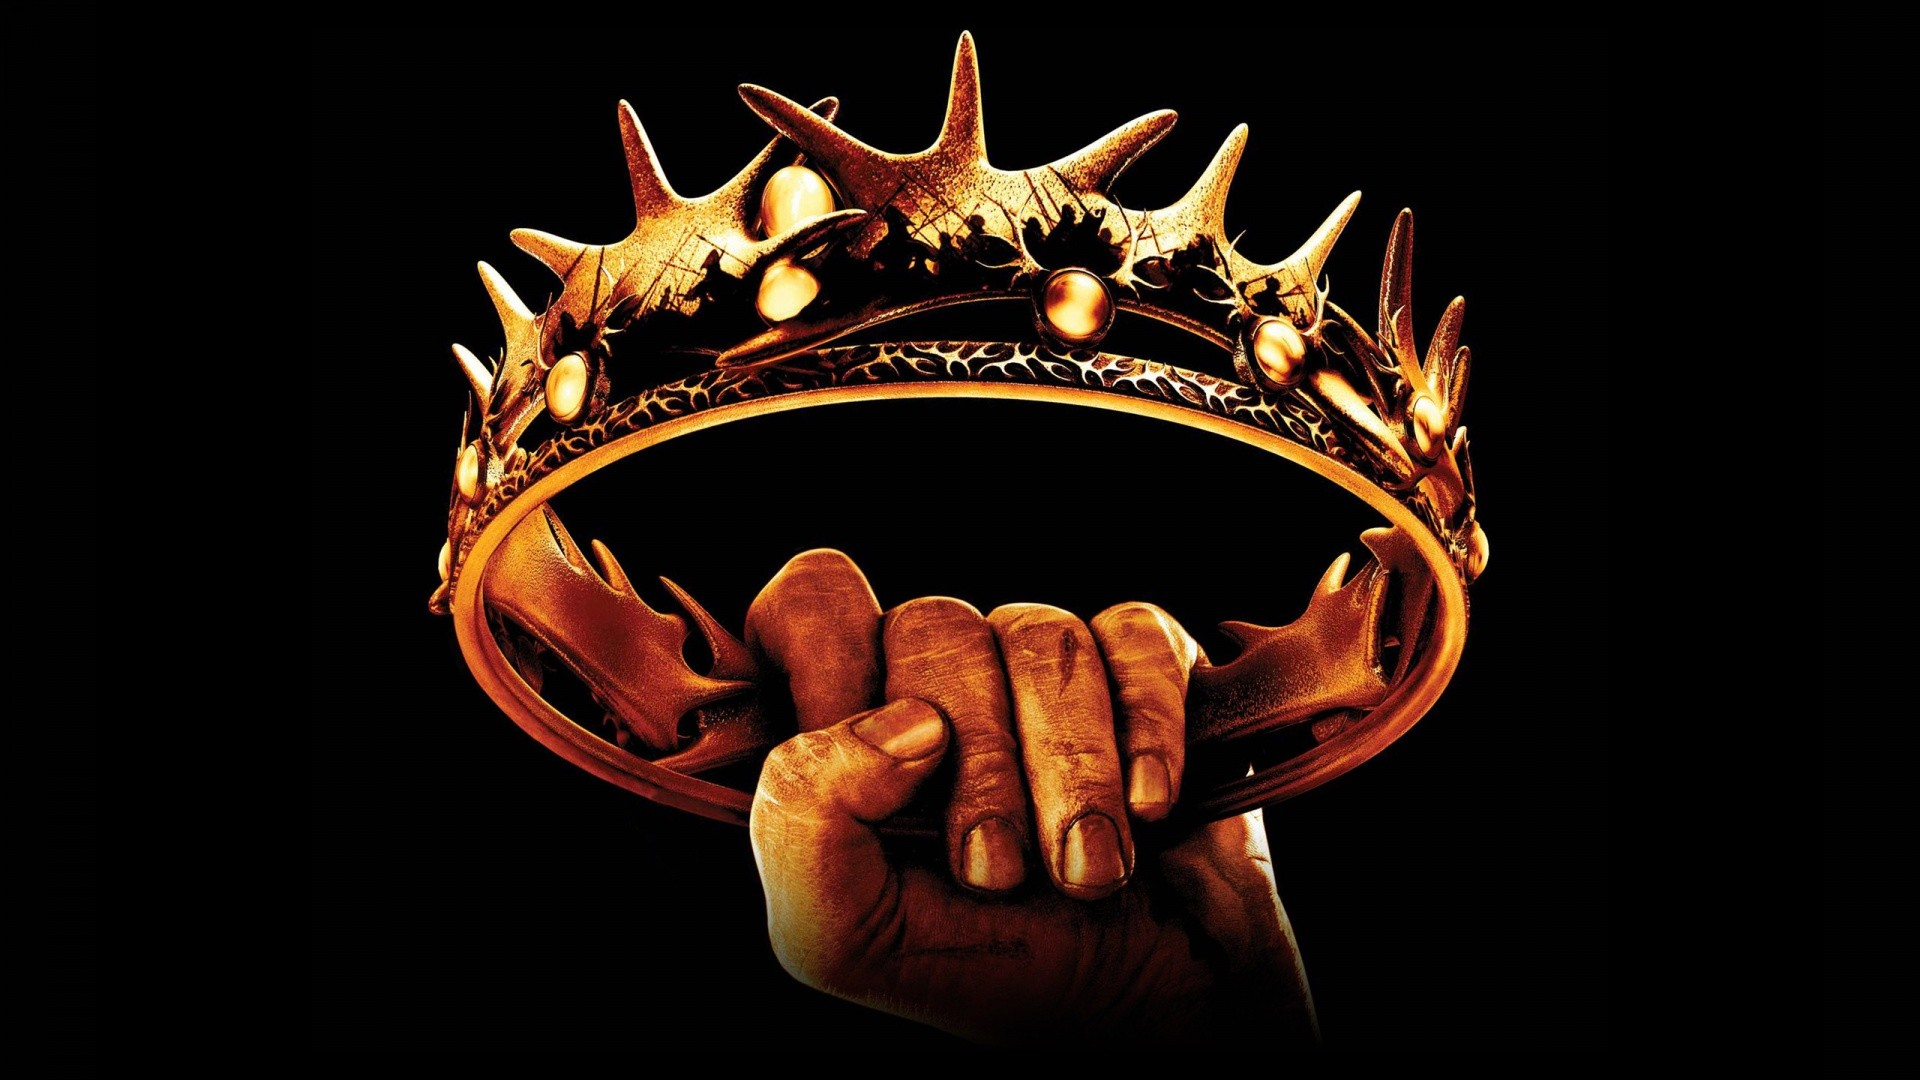 Game Of Thrones Wallpaper HD ·① Download Free Beautiful HD